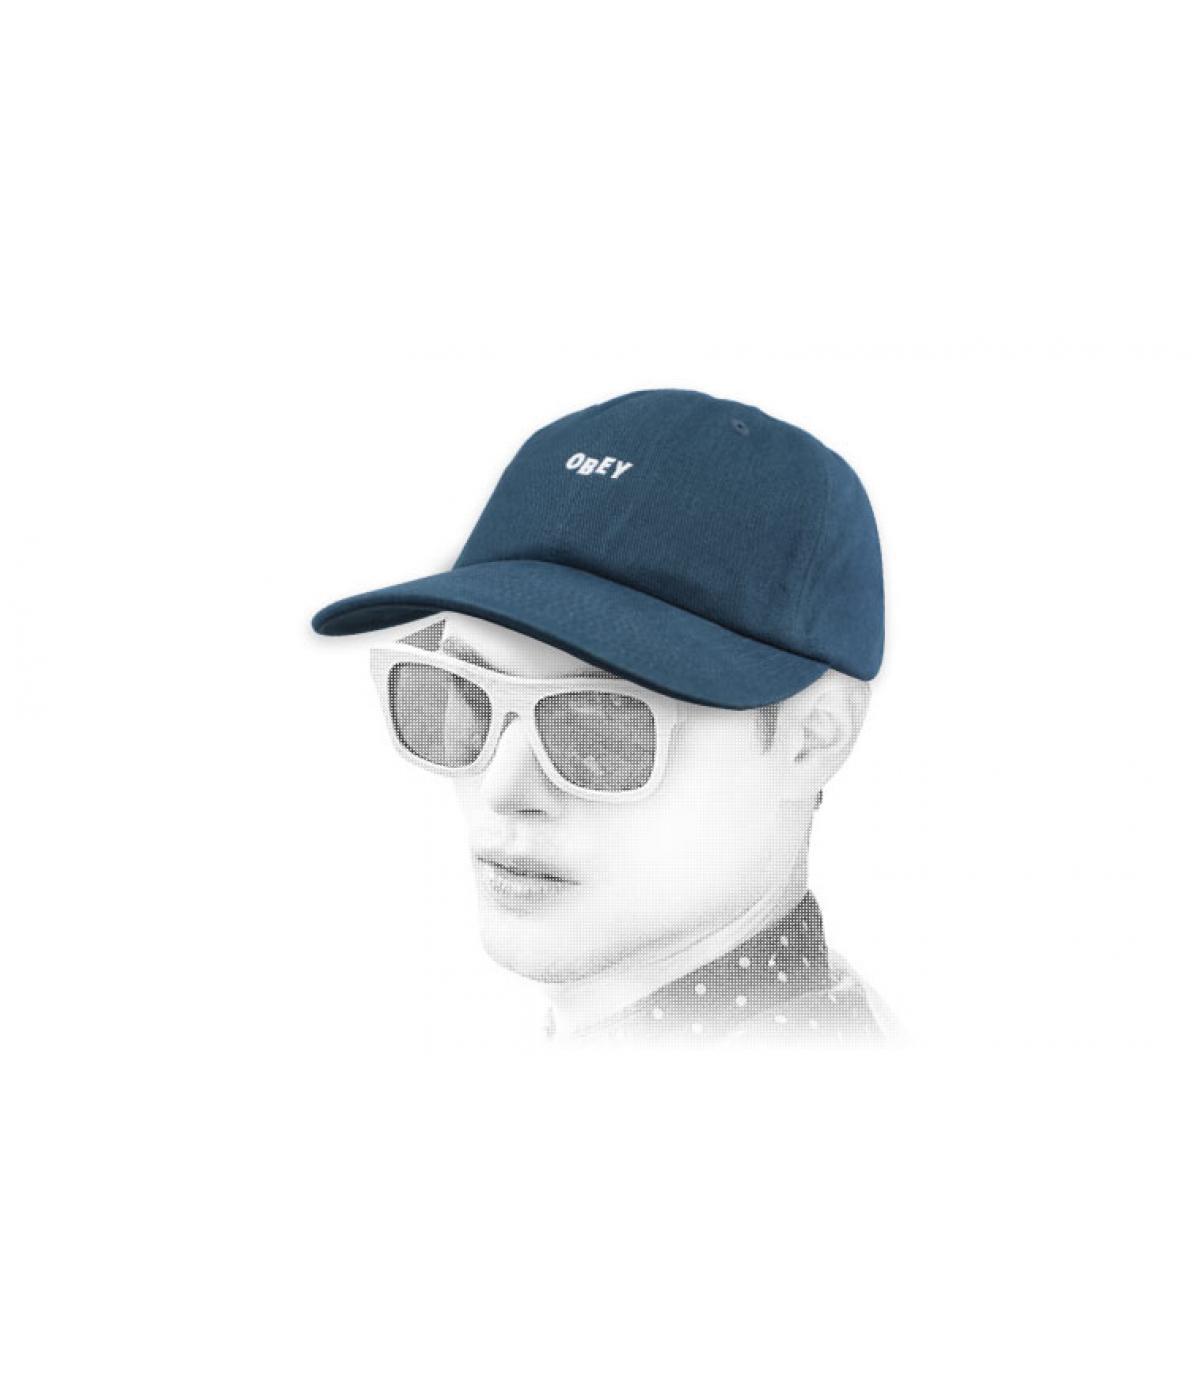 blue Obey cap